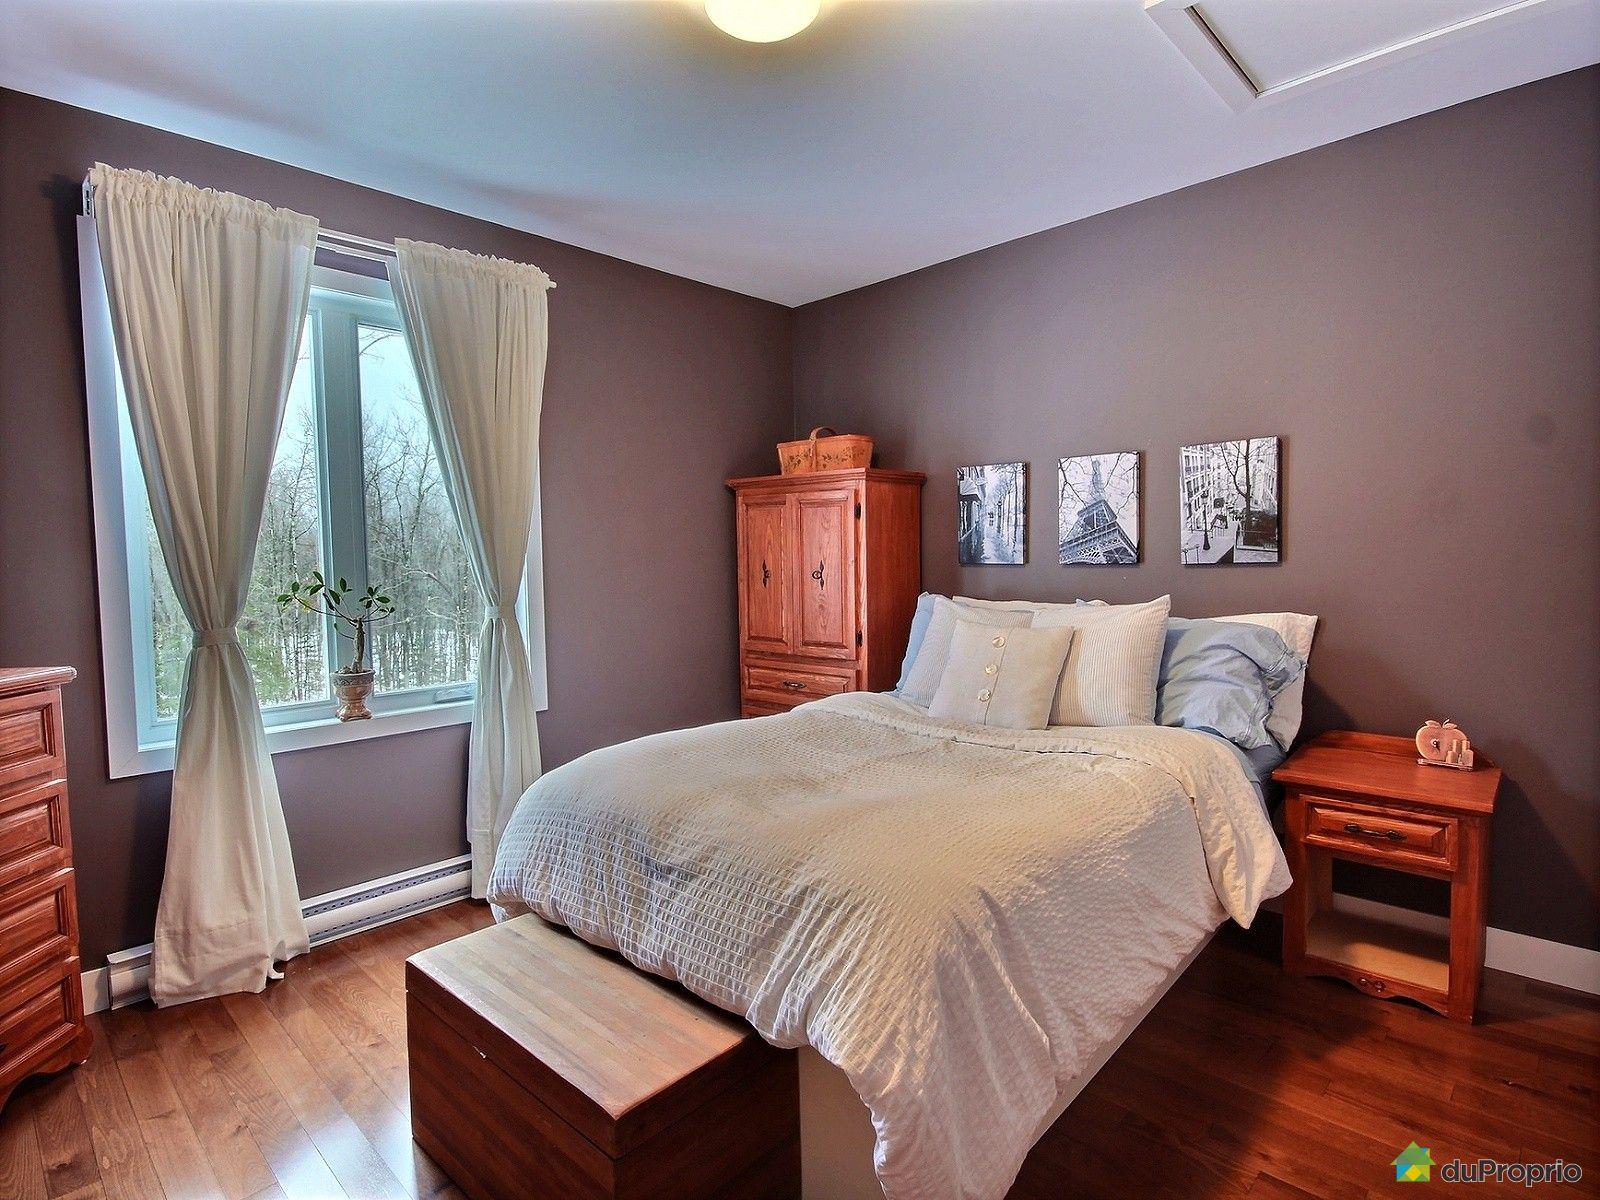 Maison vendre magog 637 rue g rard g vry immobilier for Chambre de commerce de magog